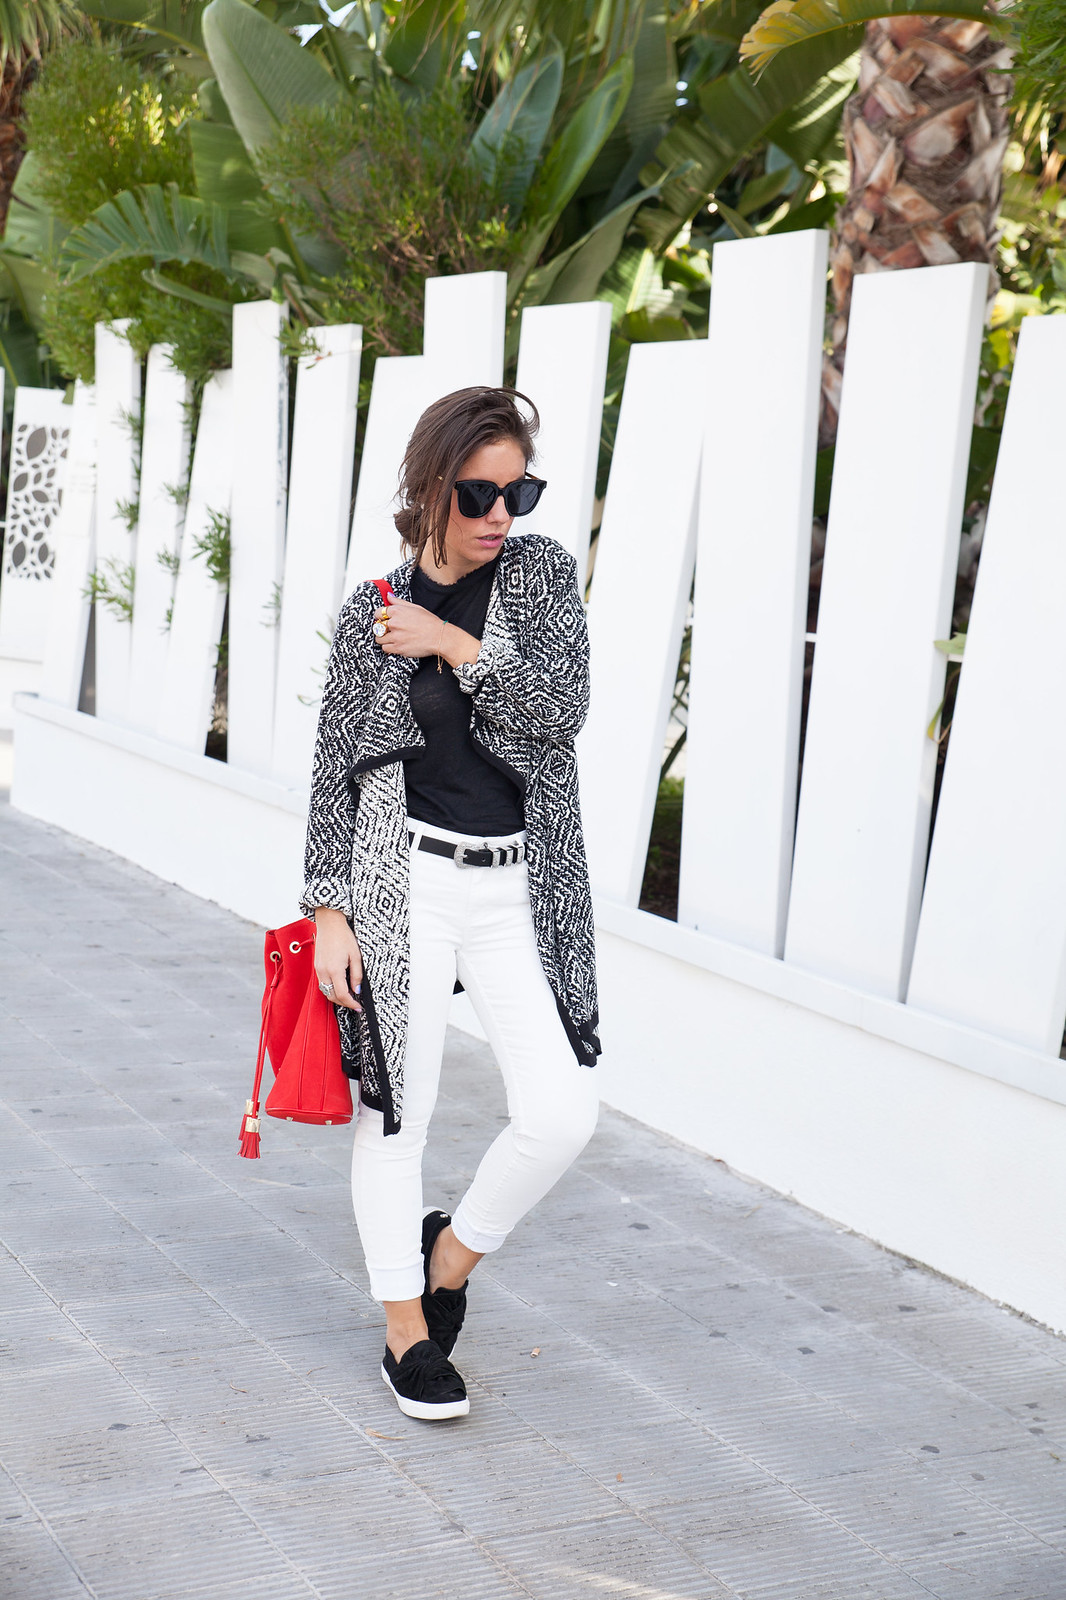 theguestgirl laura santolaria influencer emprendedora startup barcelona de moda tendencia marcas y marketing branding